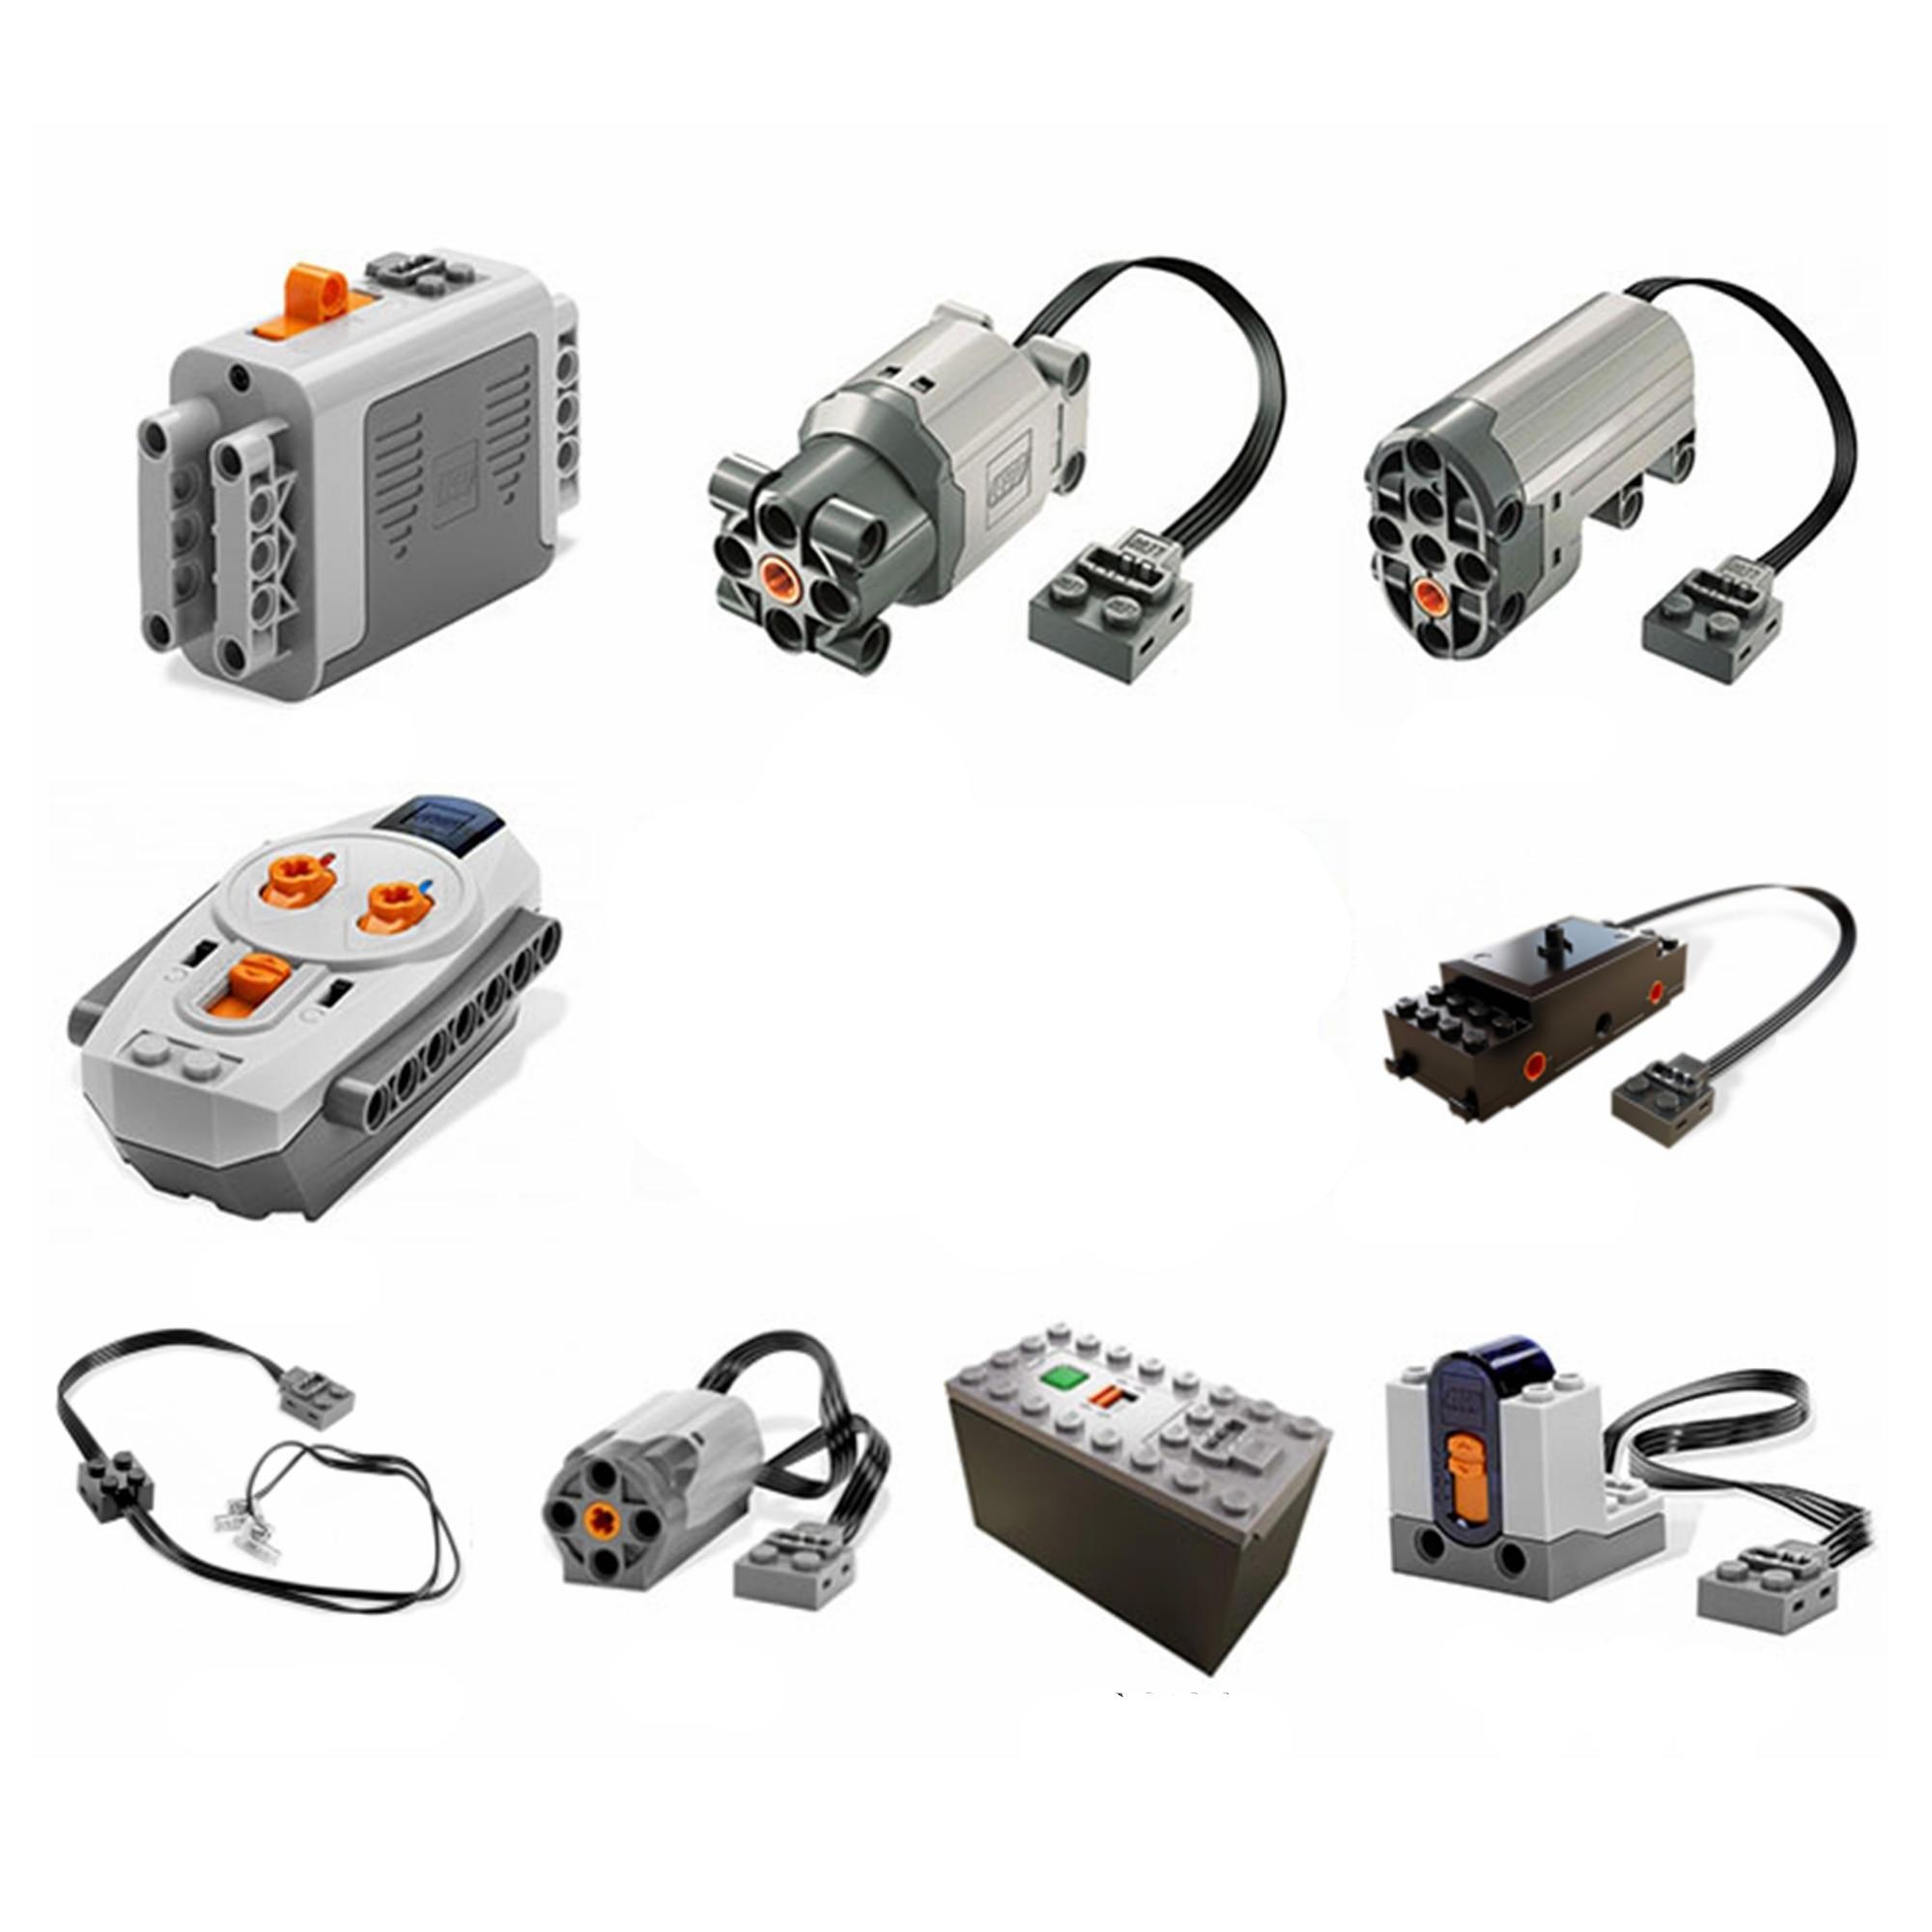 Technic Series Parts Servo Motor Battery Box Remote